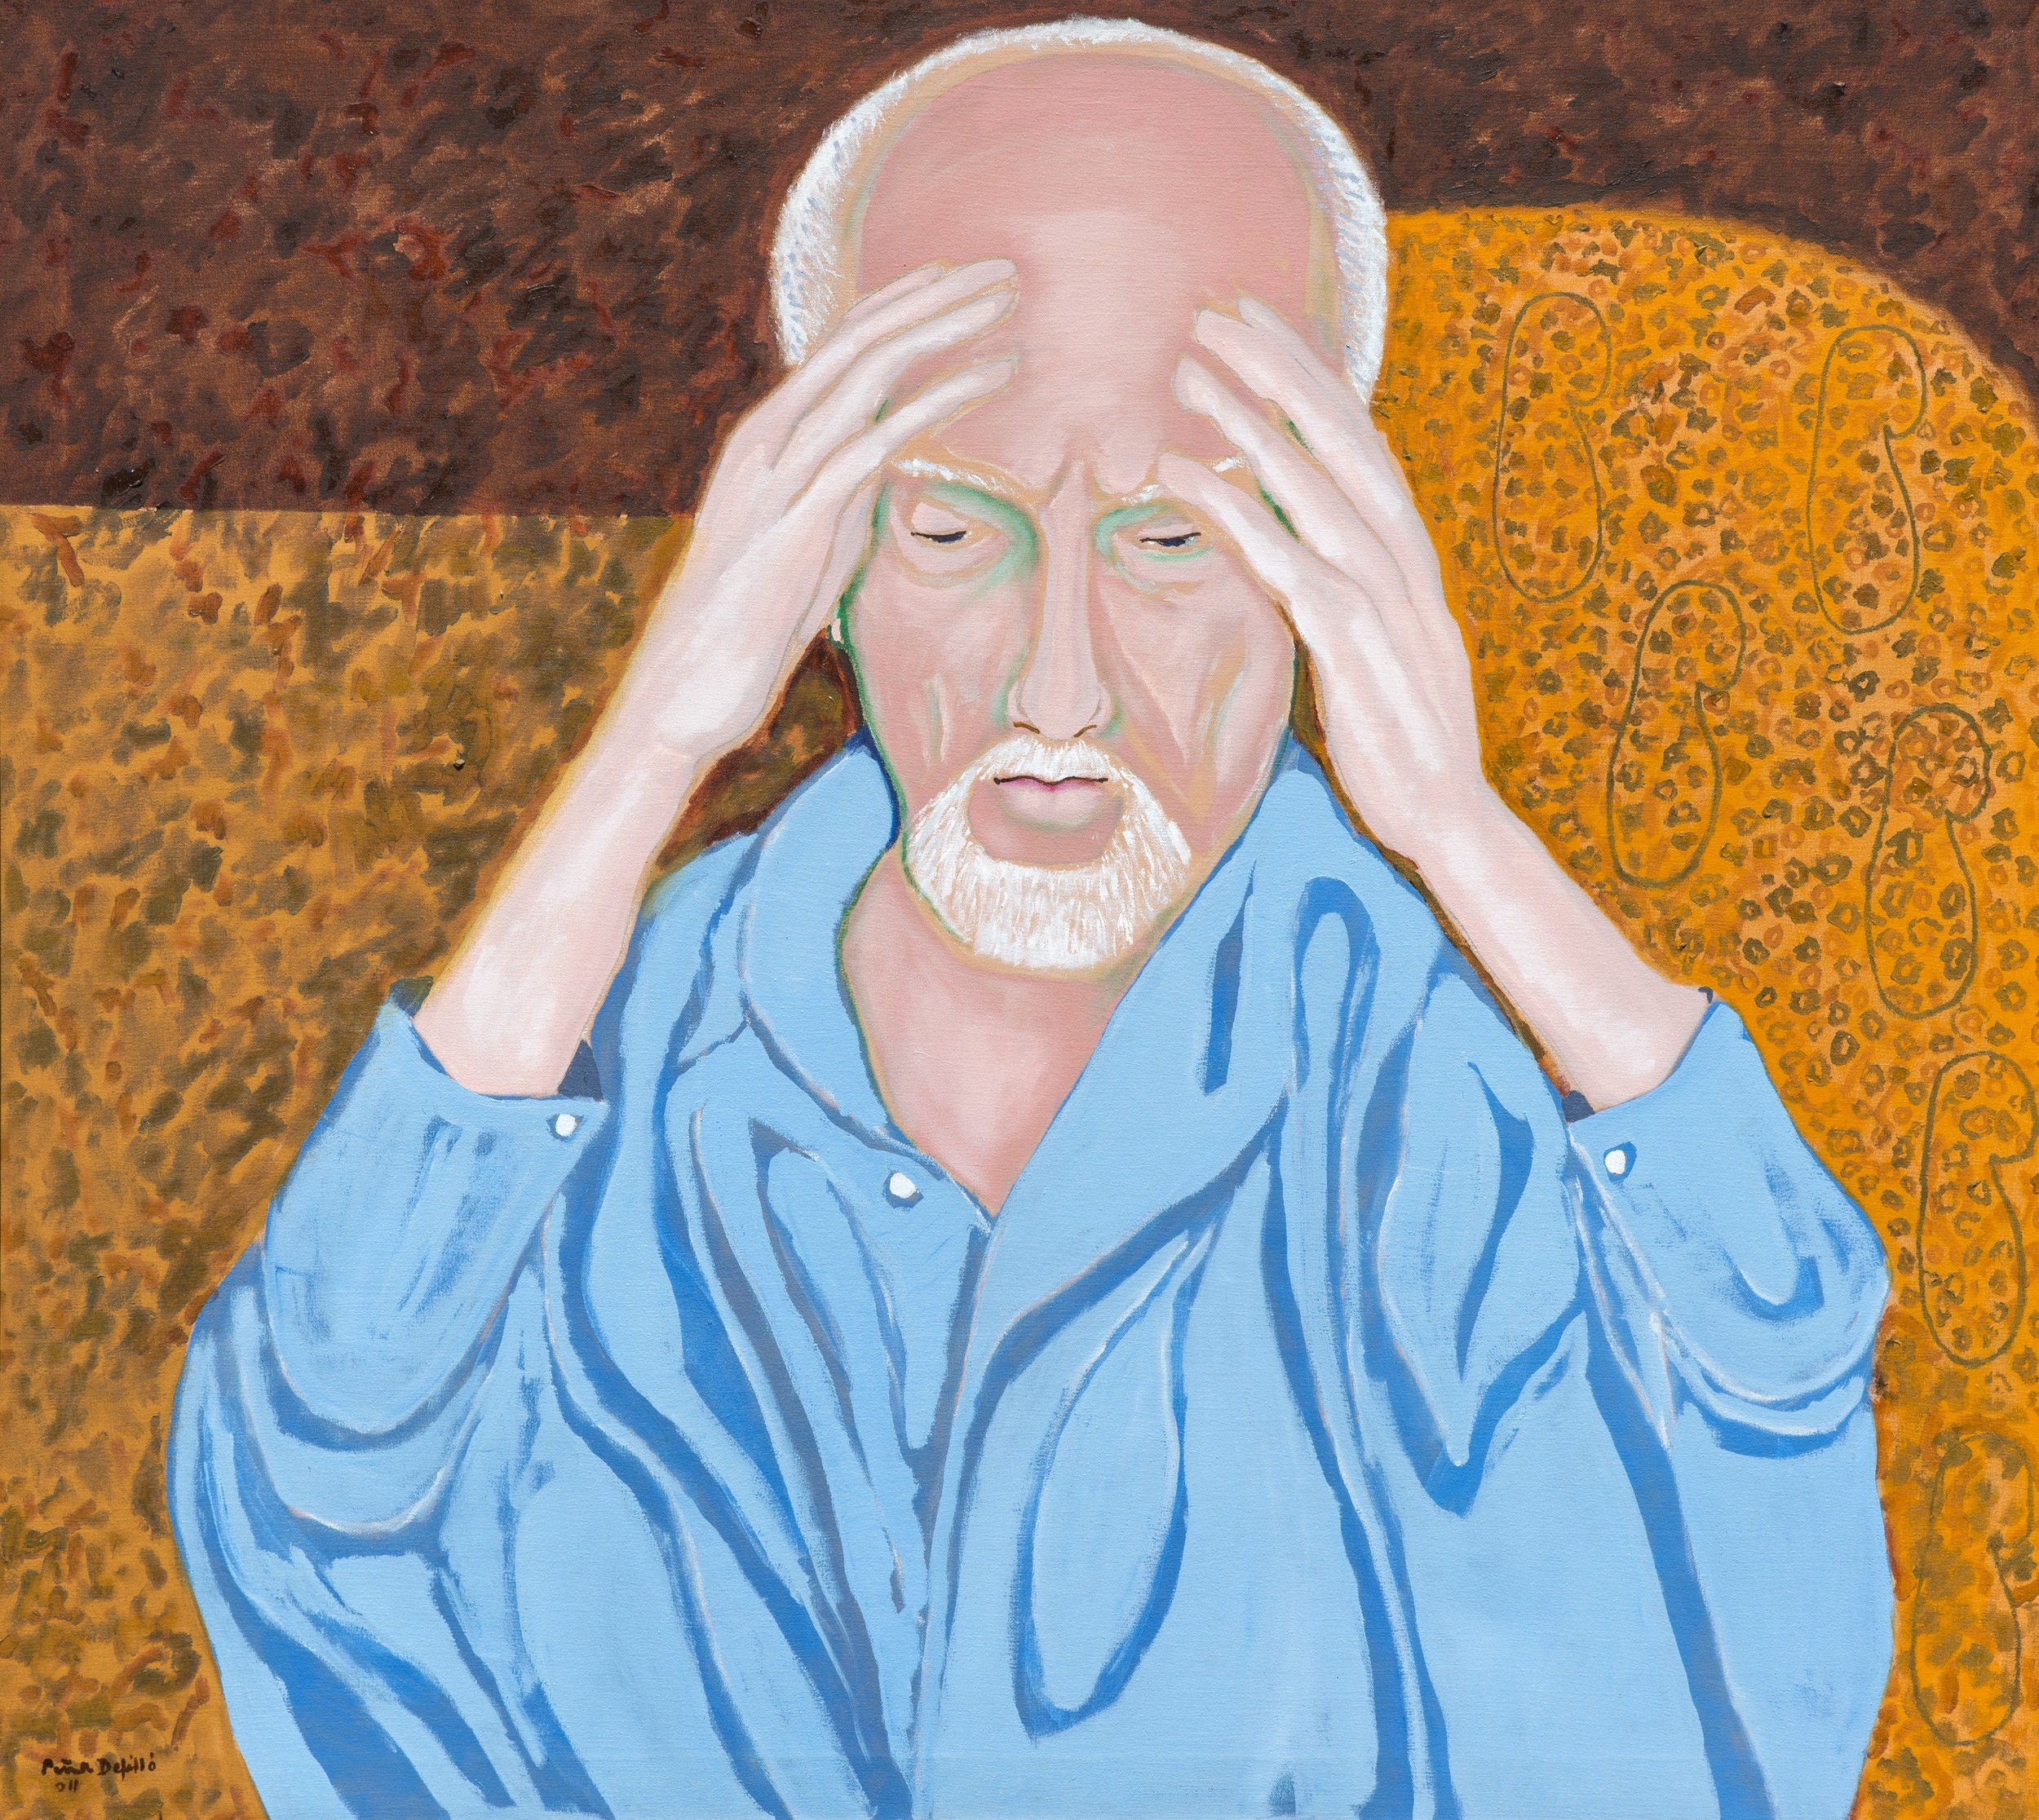 El pensador, 2011.